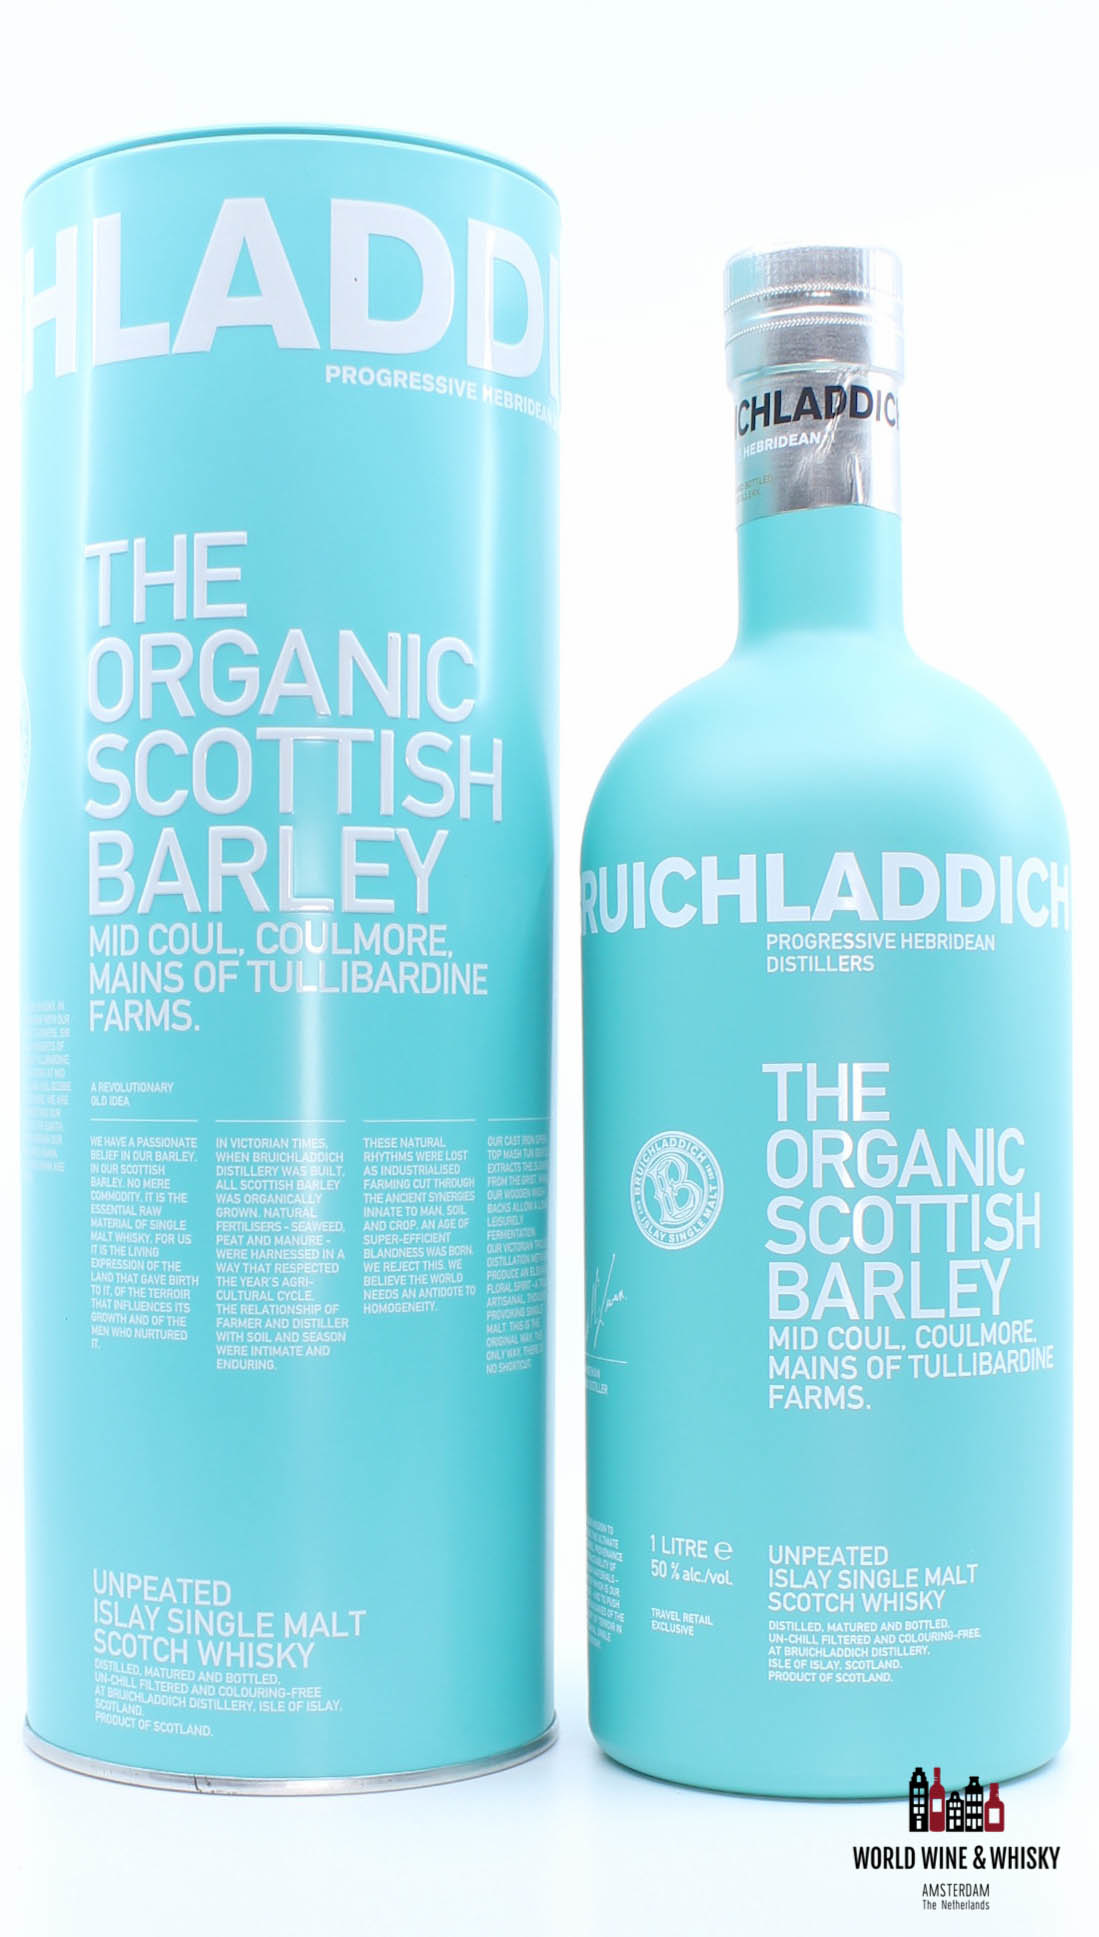 Bruichladdich Bruichladdich The Organic Scottish Barley 2014 - Travel Retail Exclusive 50% 1 Litre